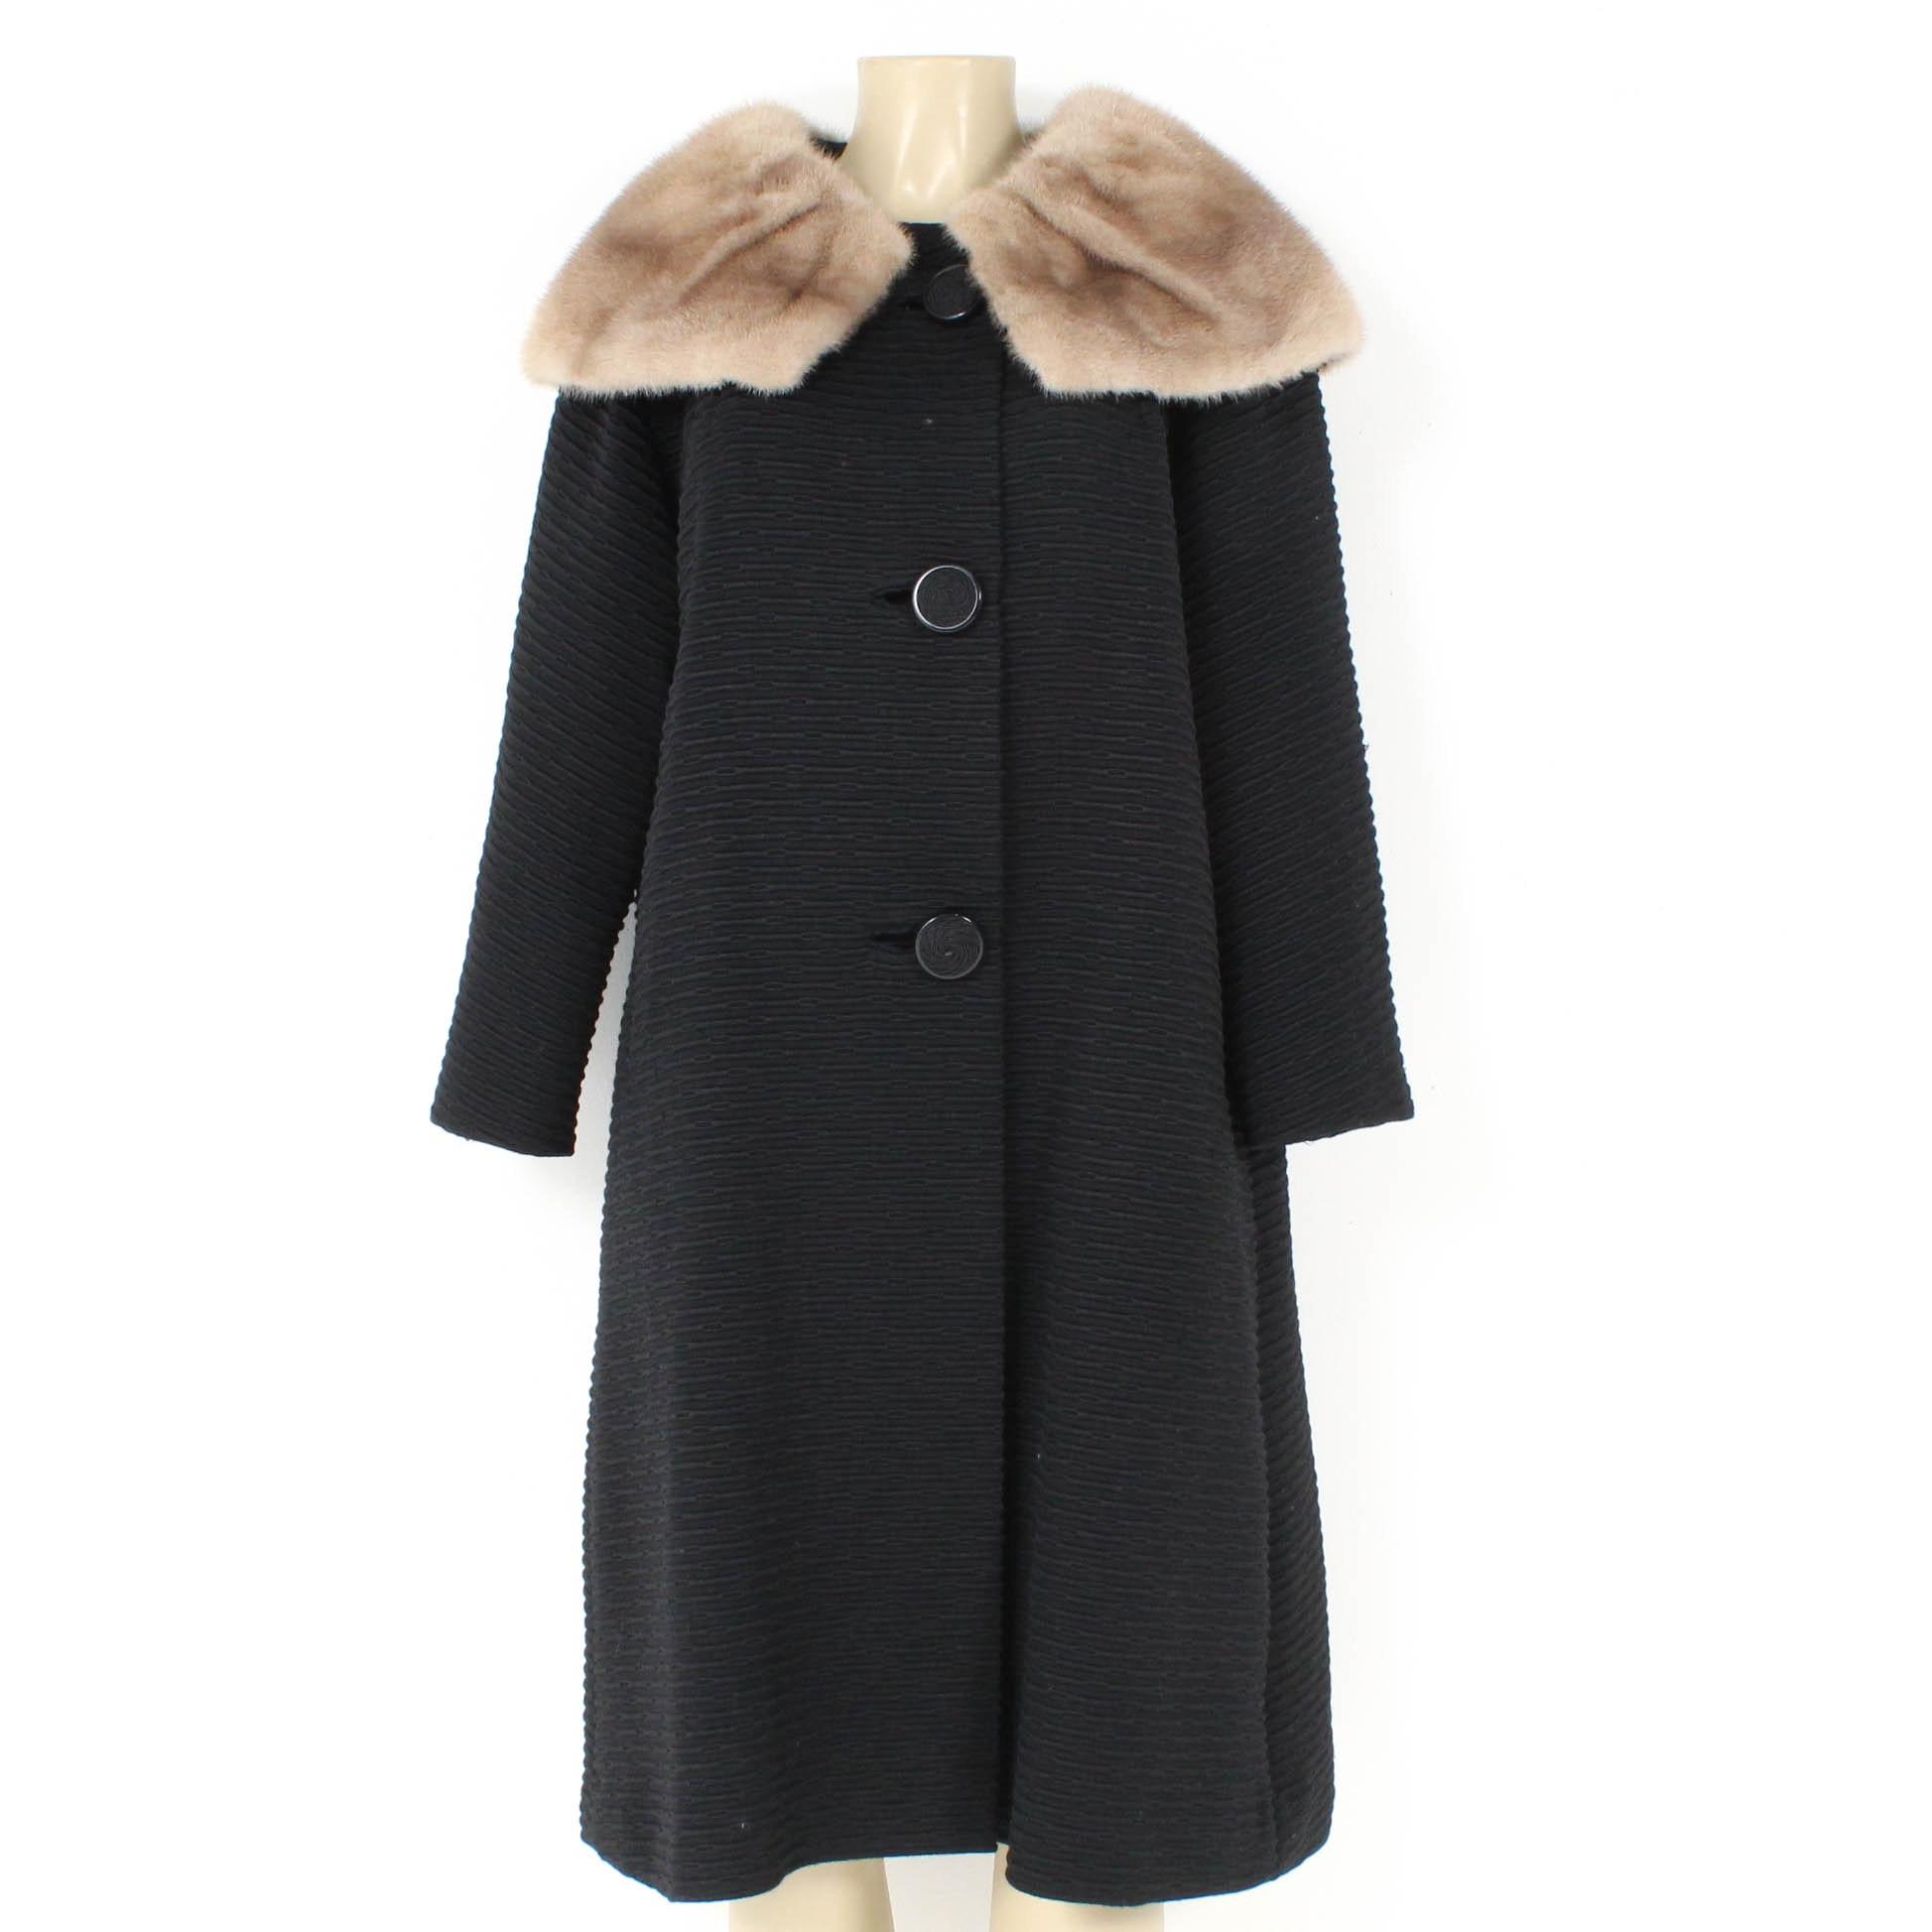 Vintage Len Artel Coat with Mink Fur Shawl Collar